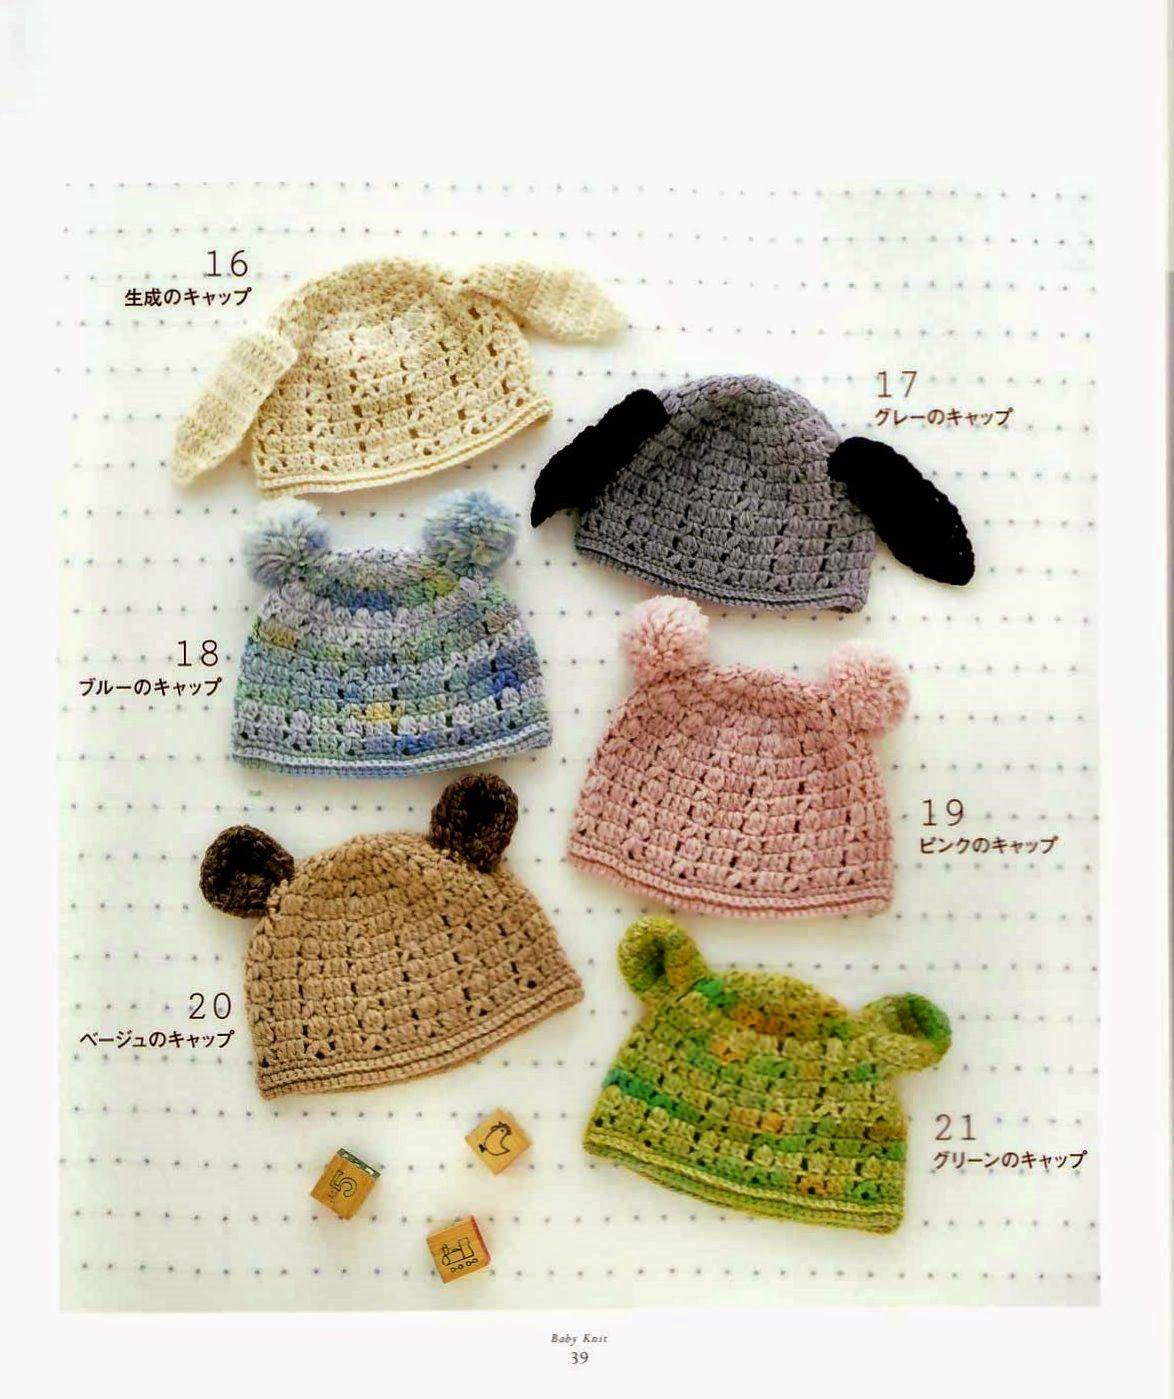 Dorable Patrones De Crochet Libre Tapa Quimioterapia Colección de ...